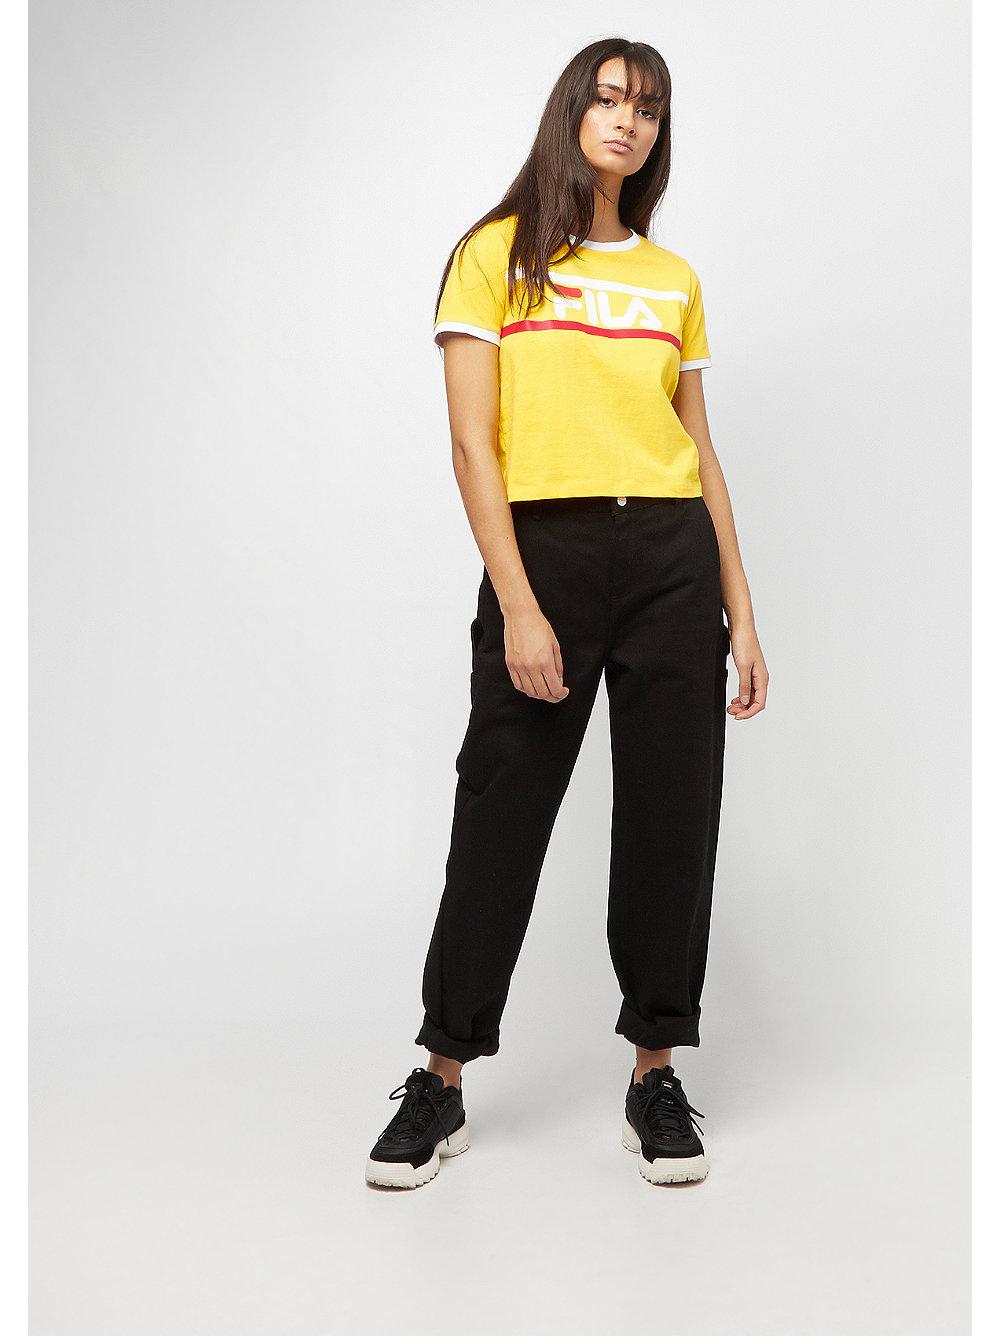 Fila Urban Line Ashley Cropped T Shirt Empire Yellow